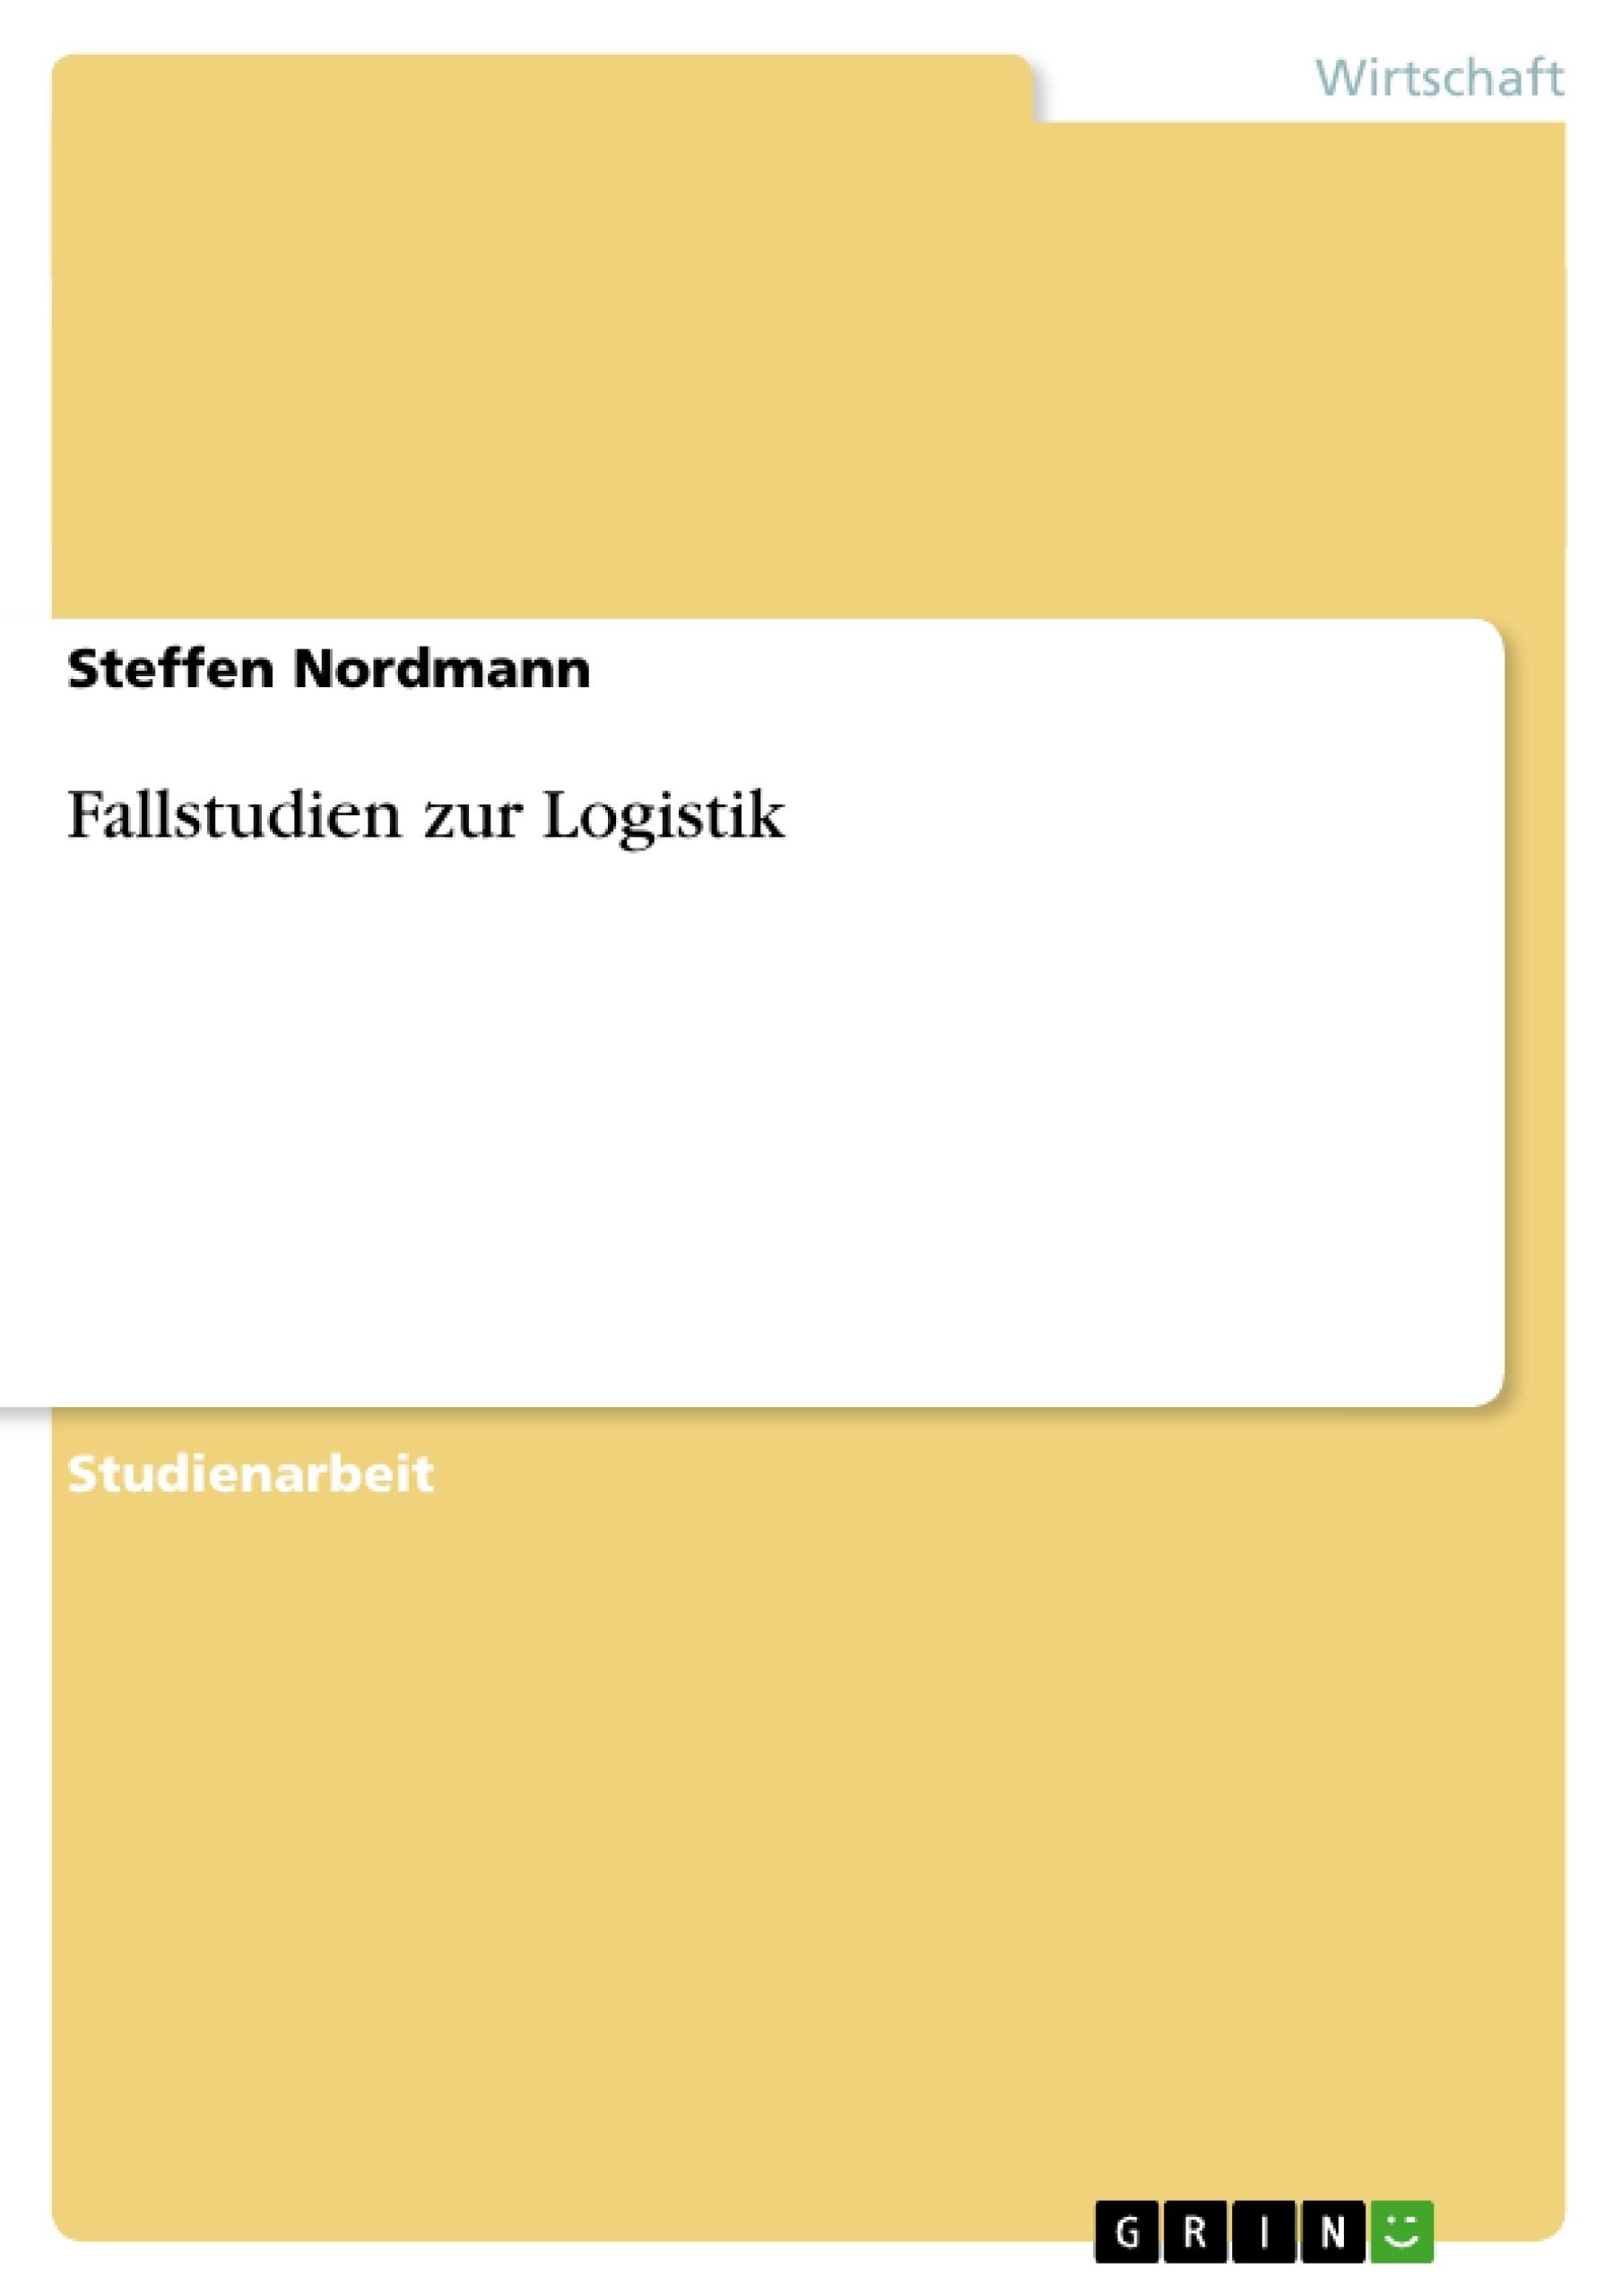 Titel: Fallstudien zur Logistik